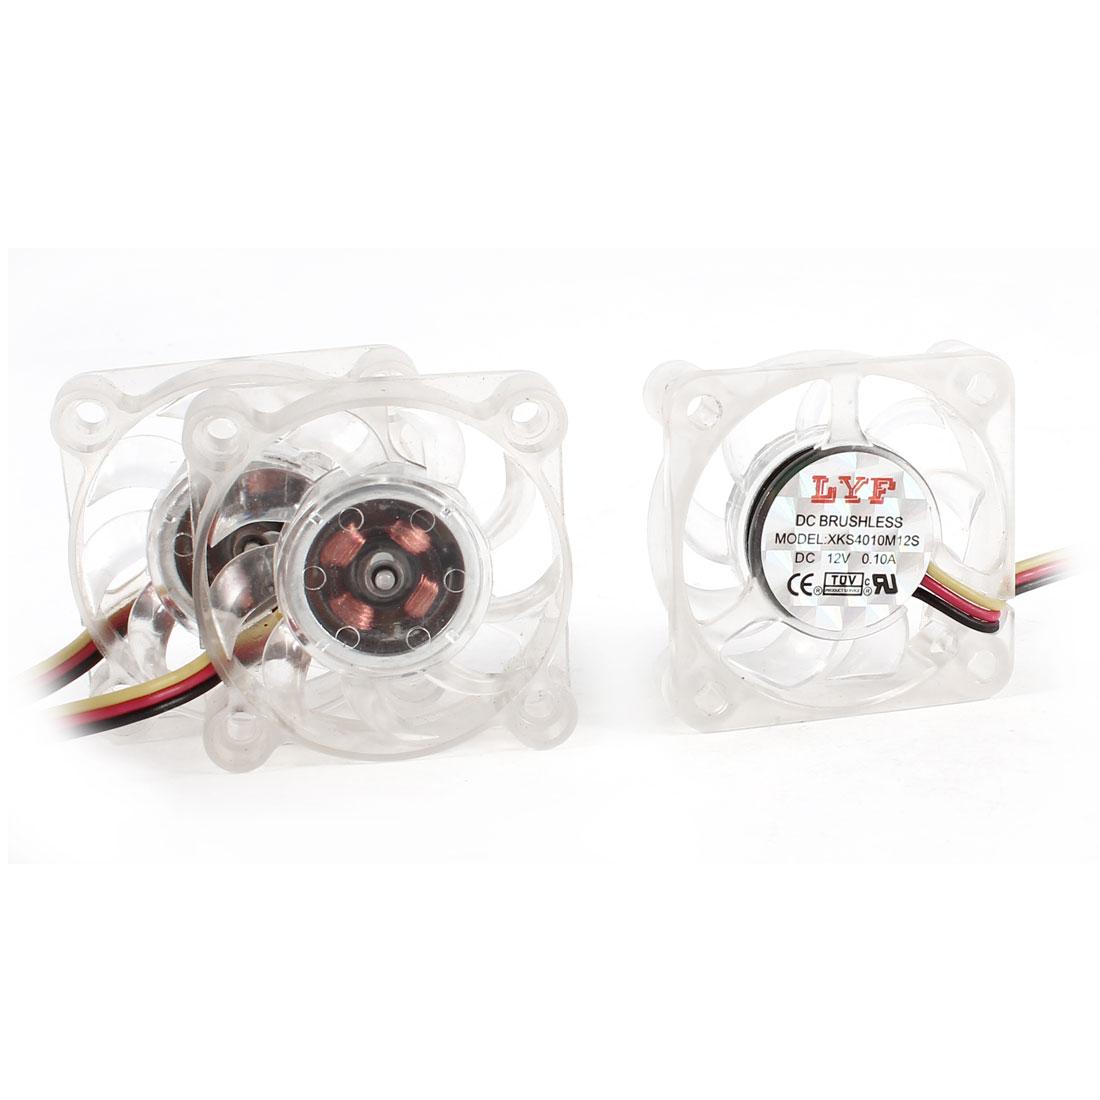 40mm Square Clear Computer Cooler Cooling Fan DC 12V 0.10A 3 Pcs